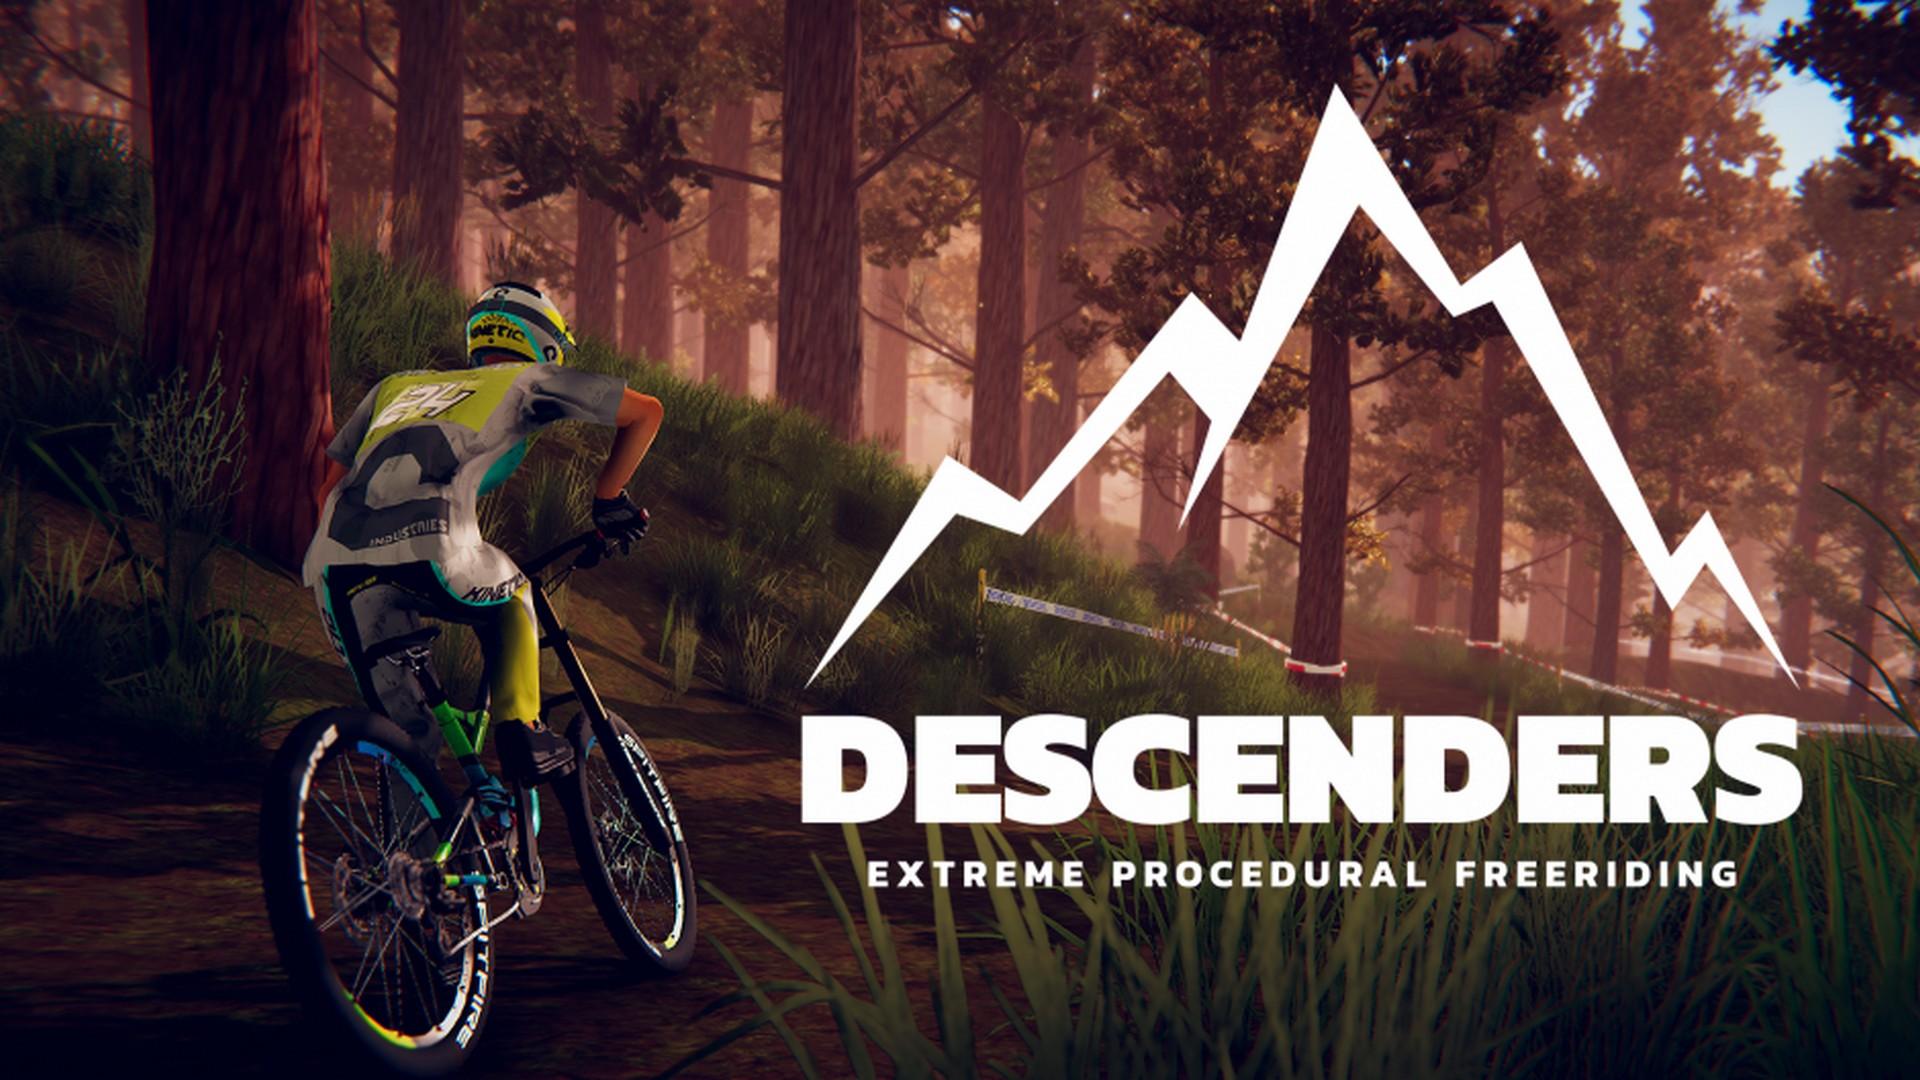 Descenders – Riding Onto Nintendo Switch 6th November